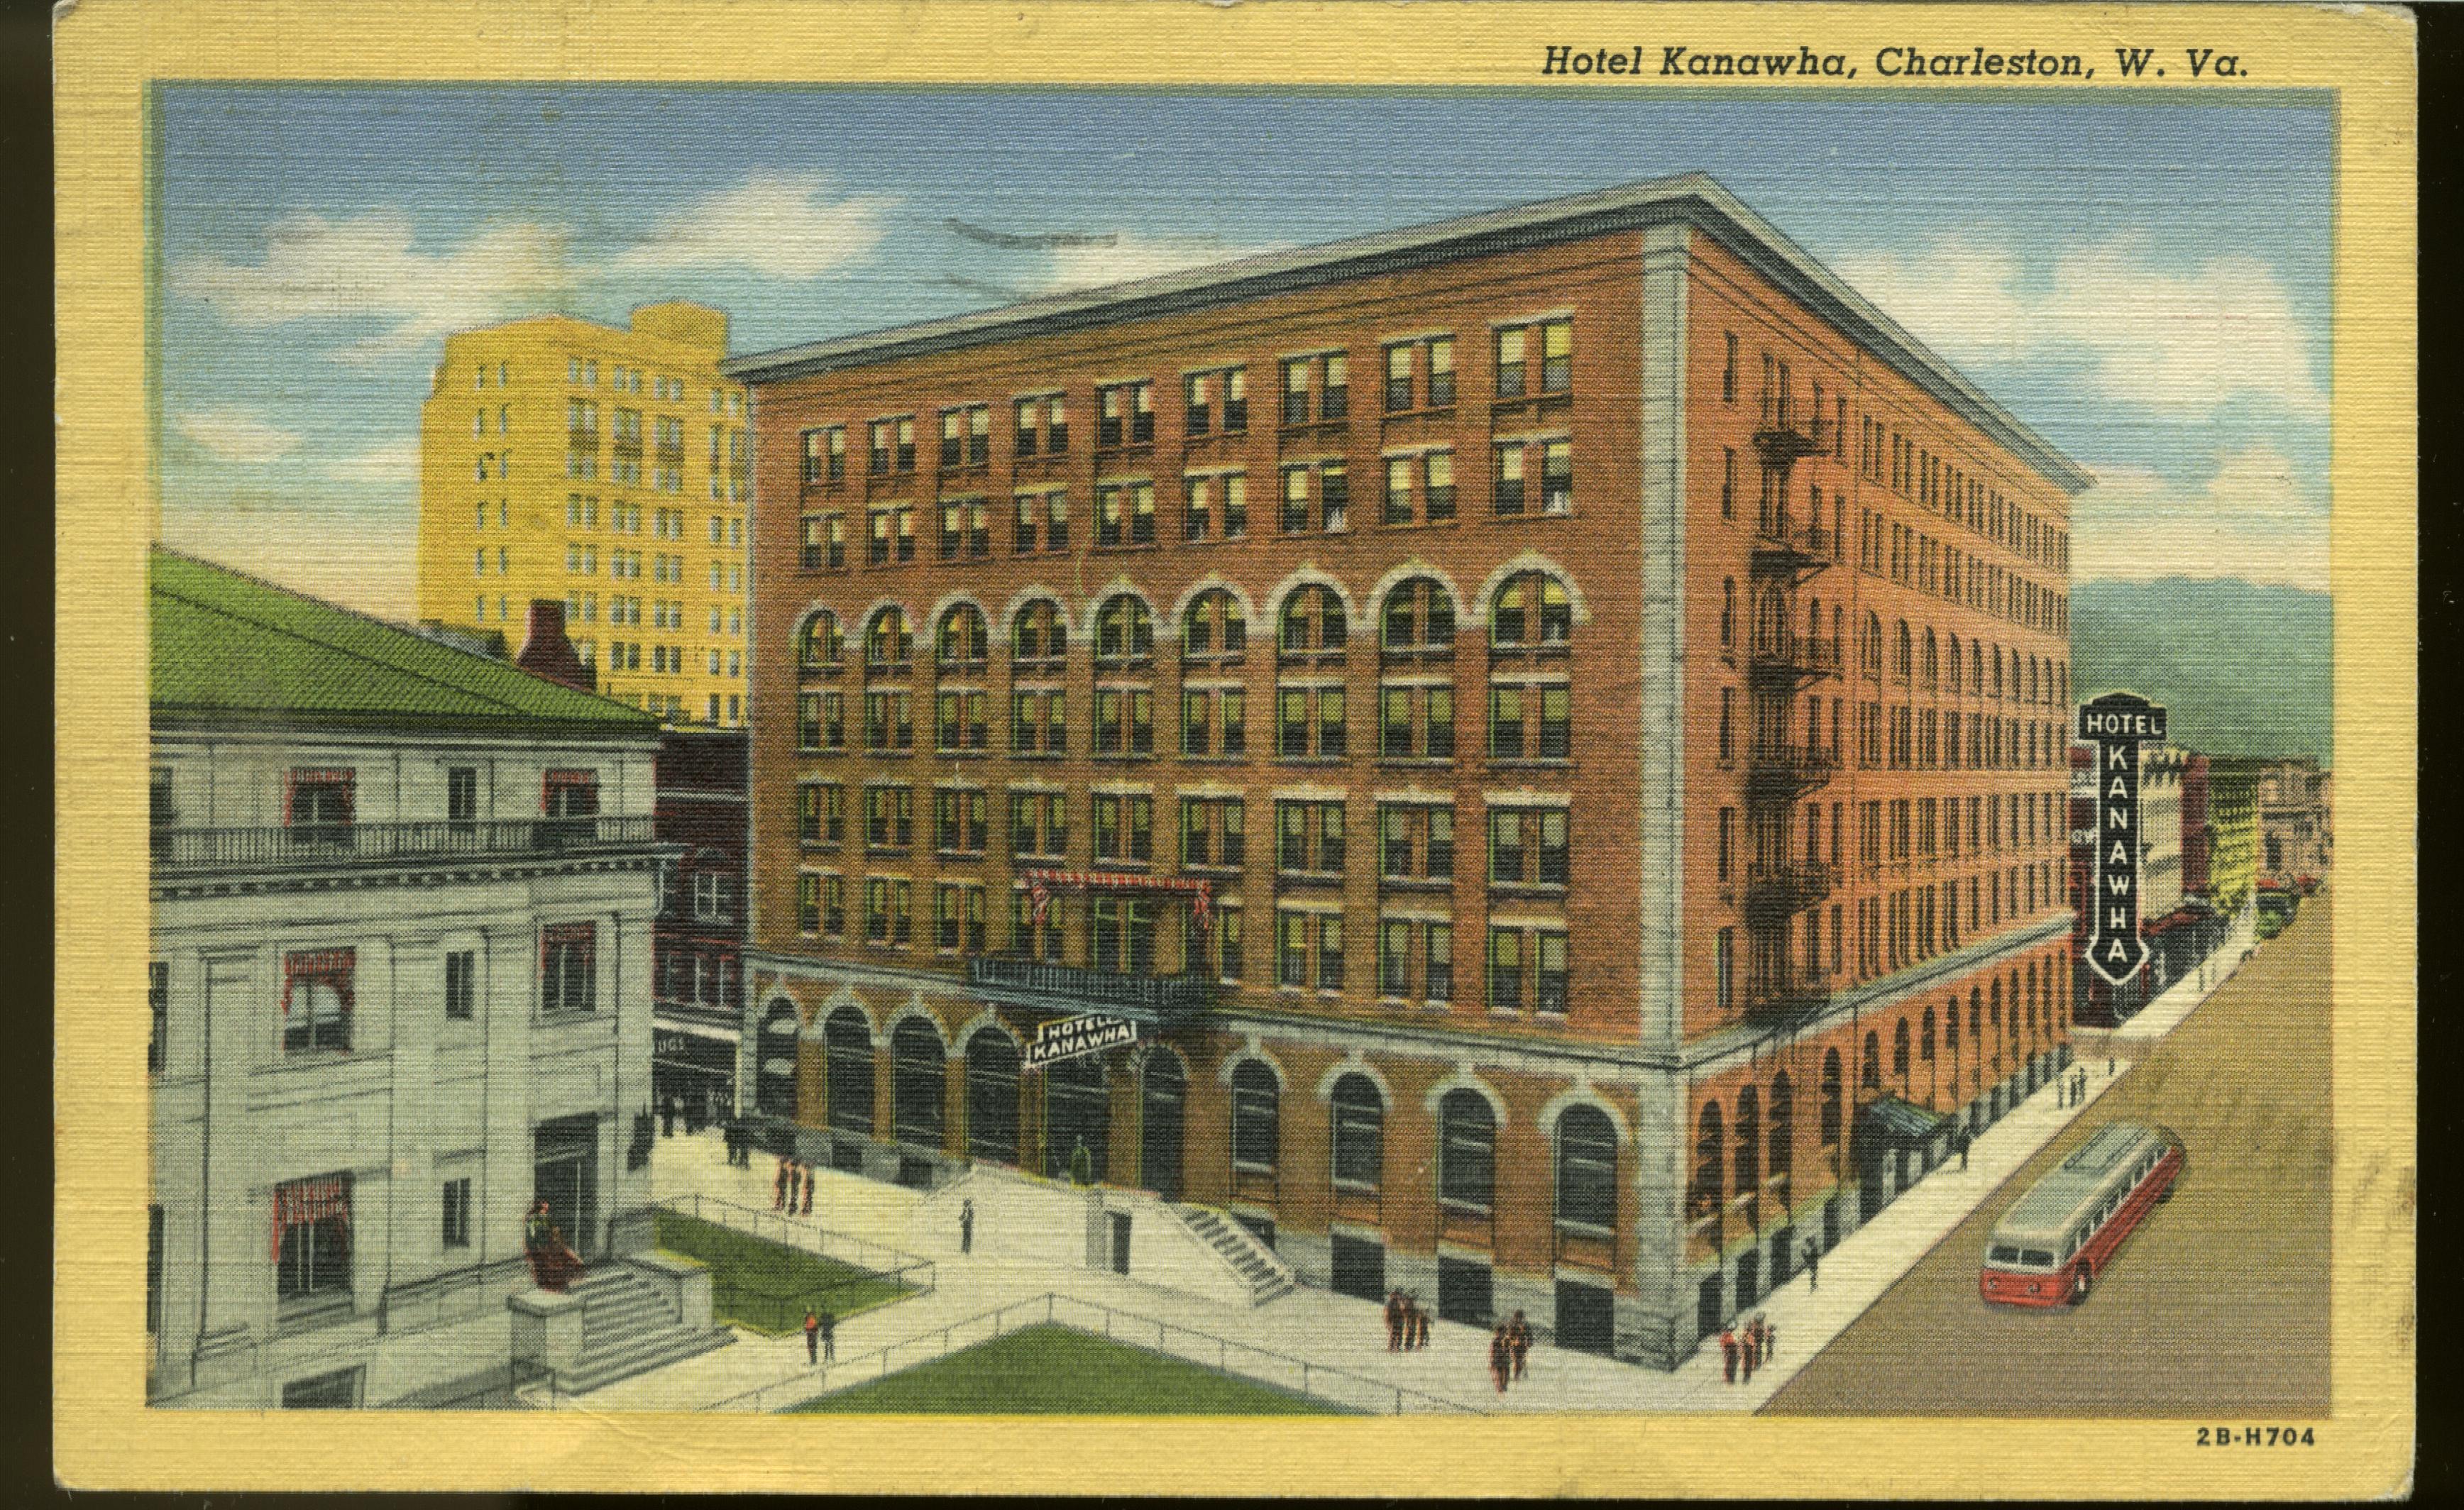 1945 postcard of the Kanawha Hotel